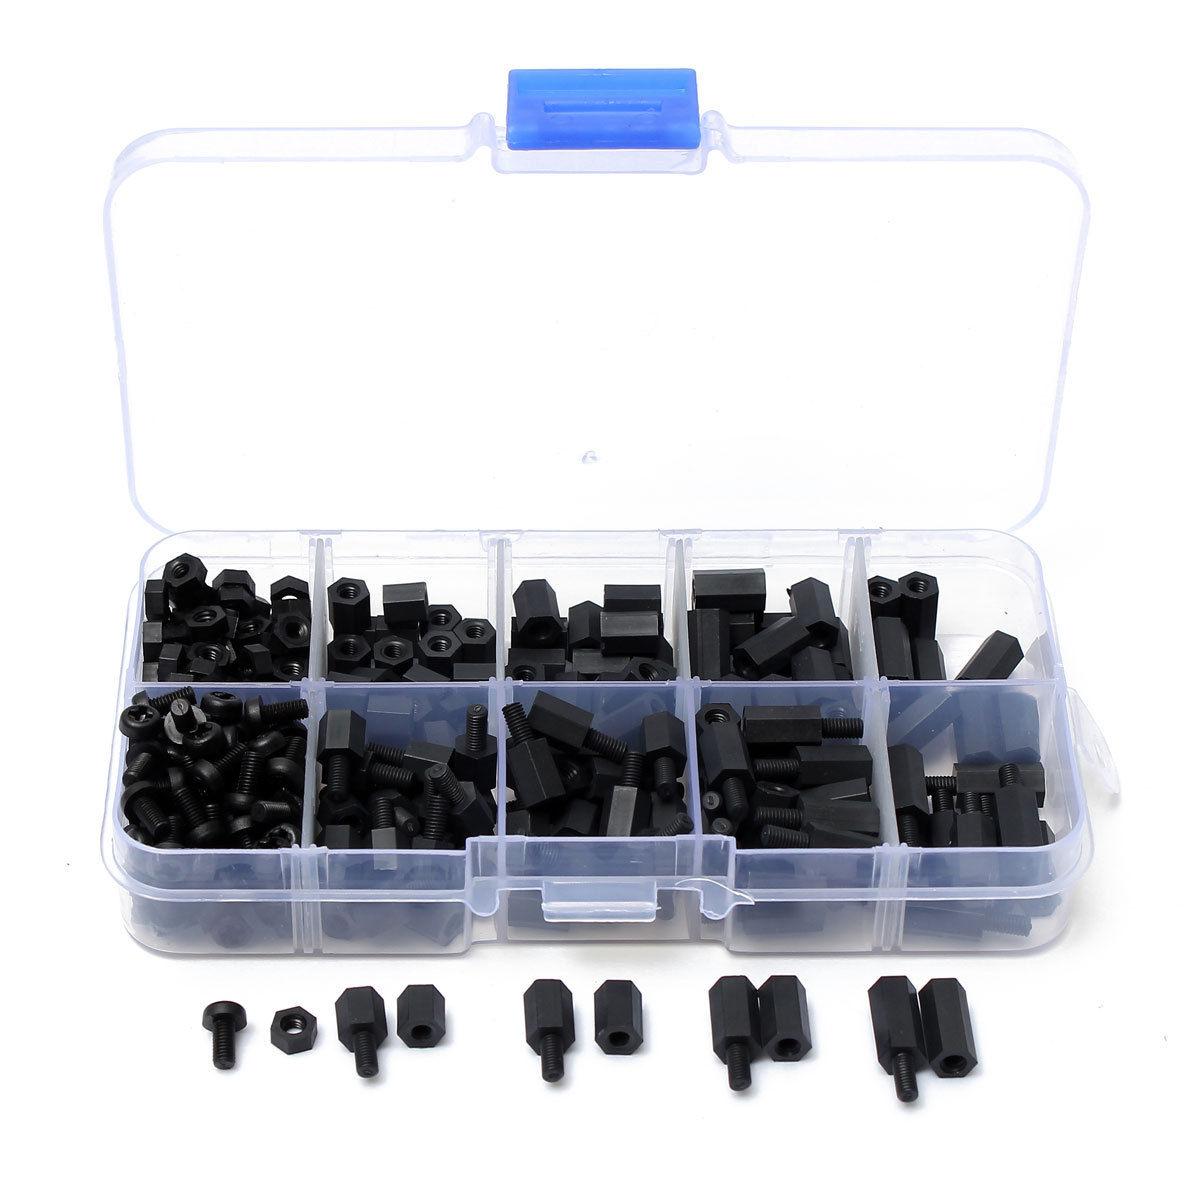 CNIM Hot 300pcs M3 Nylon Black M-F Hex Spacers Screw Nut Assortment Kit Stand-off Set кепка для гольфа callaway cap euro style work 2014